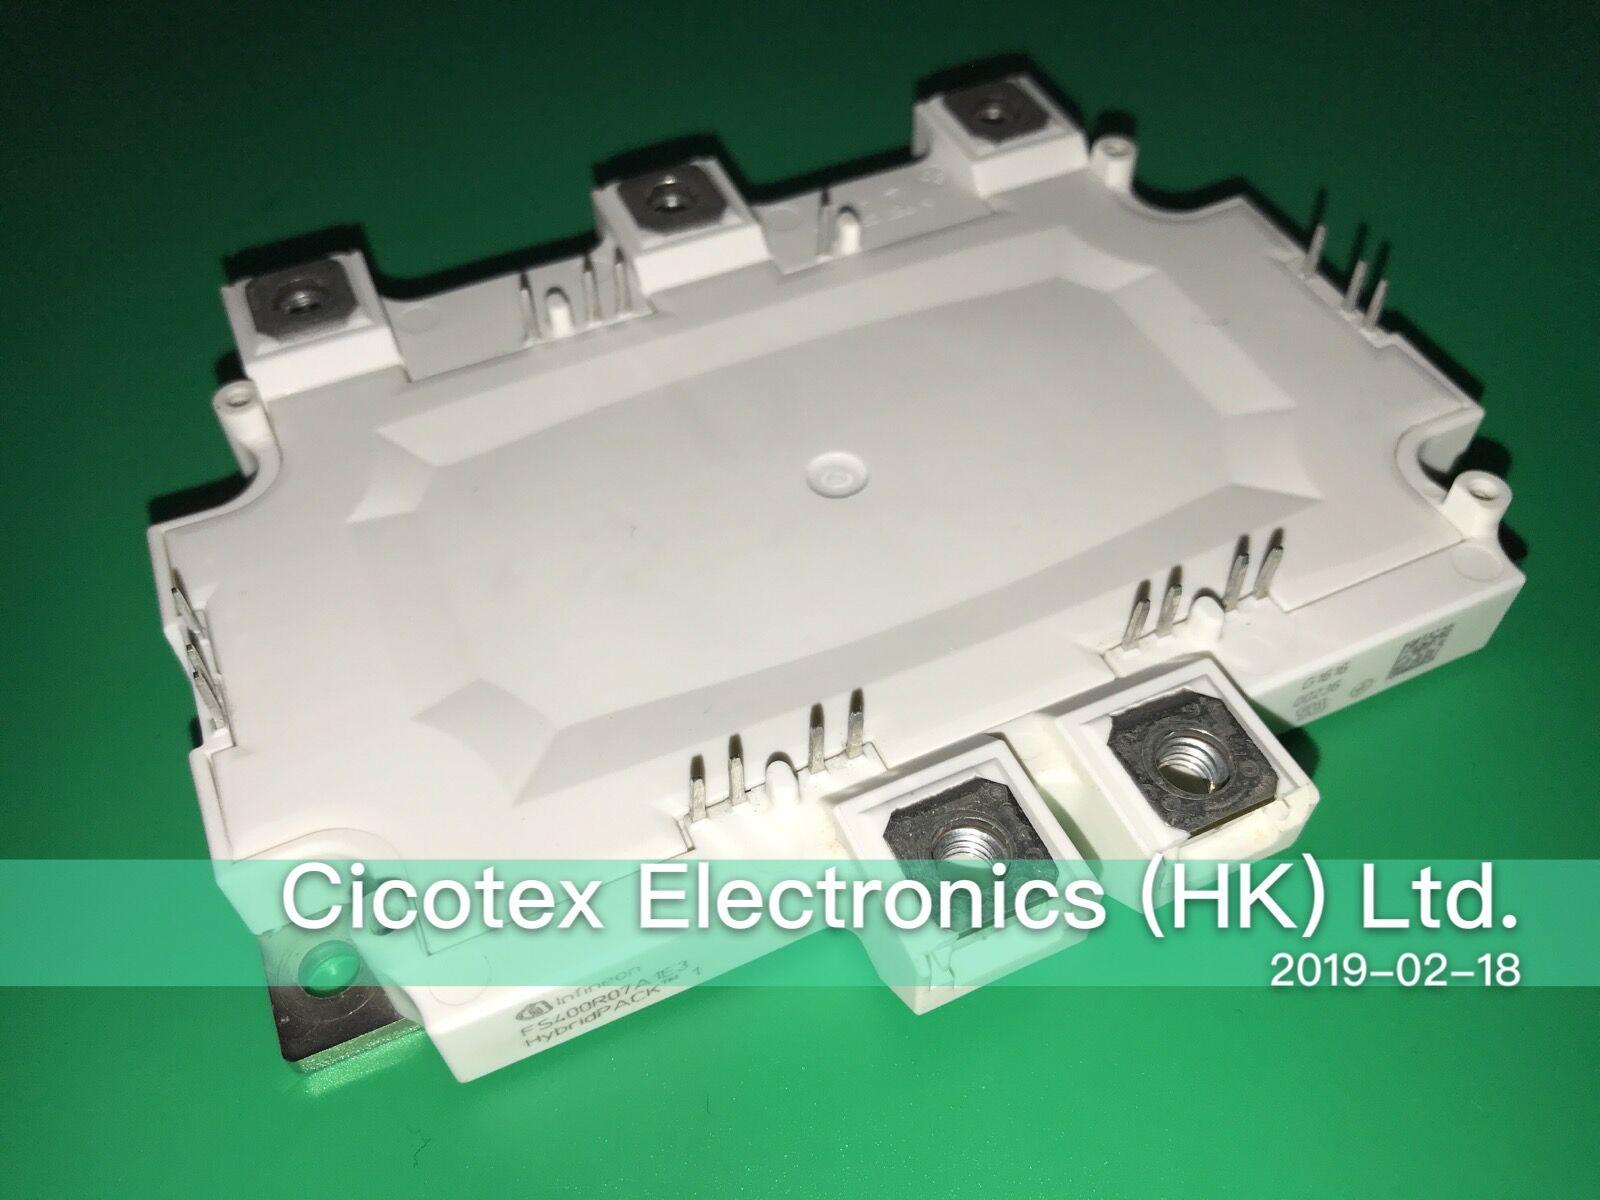 FS400R07A1E3 Module IGBT 650V 500A 1250W FS400R07AIE3 FS400R07A1E3BOSA1